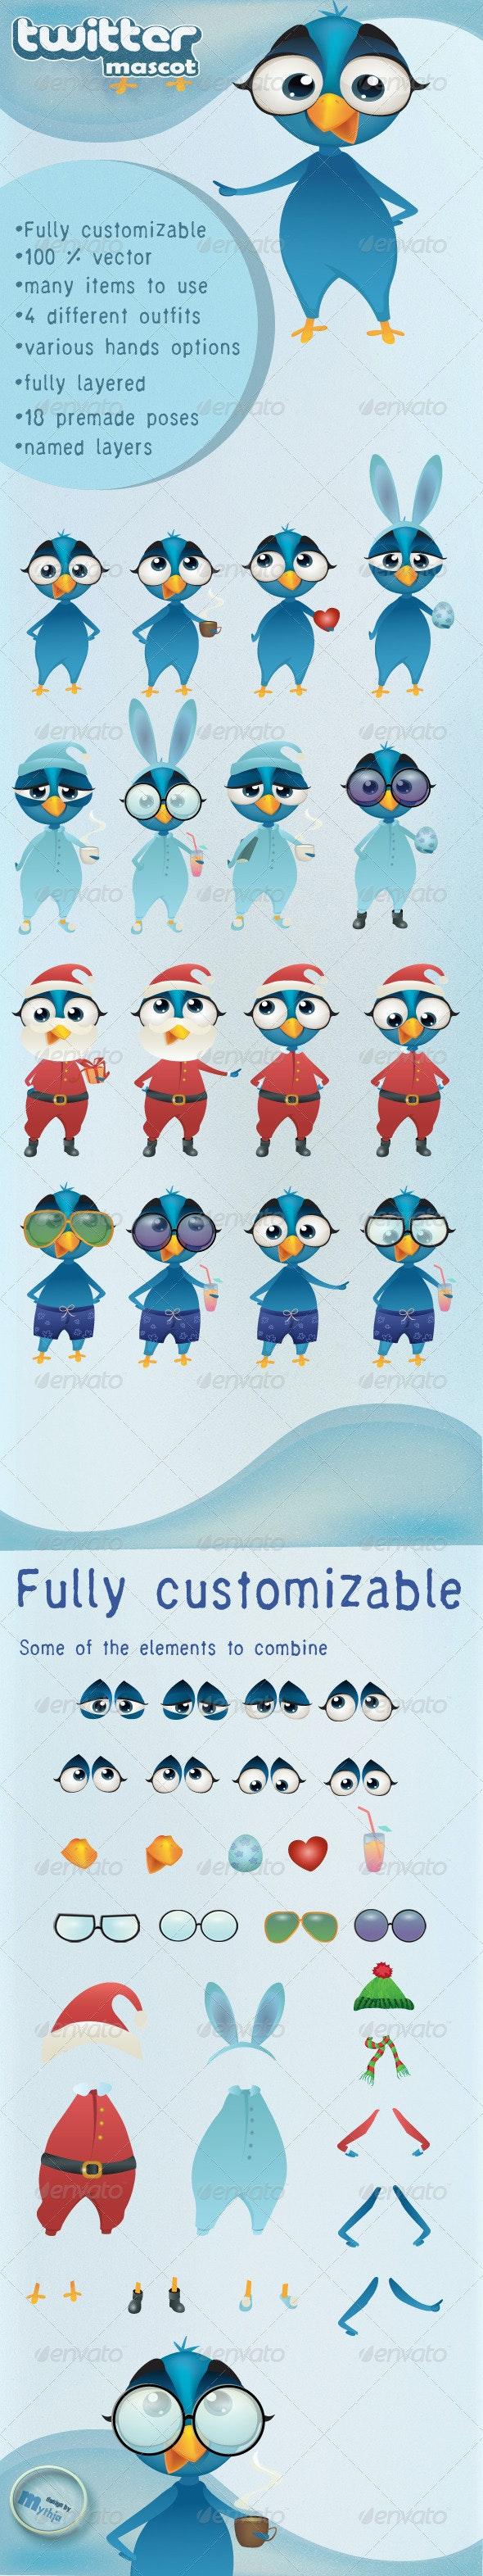 Twitter bird vector mascot - fully customizable - Characters Vectors